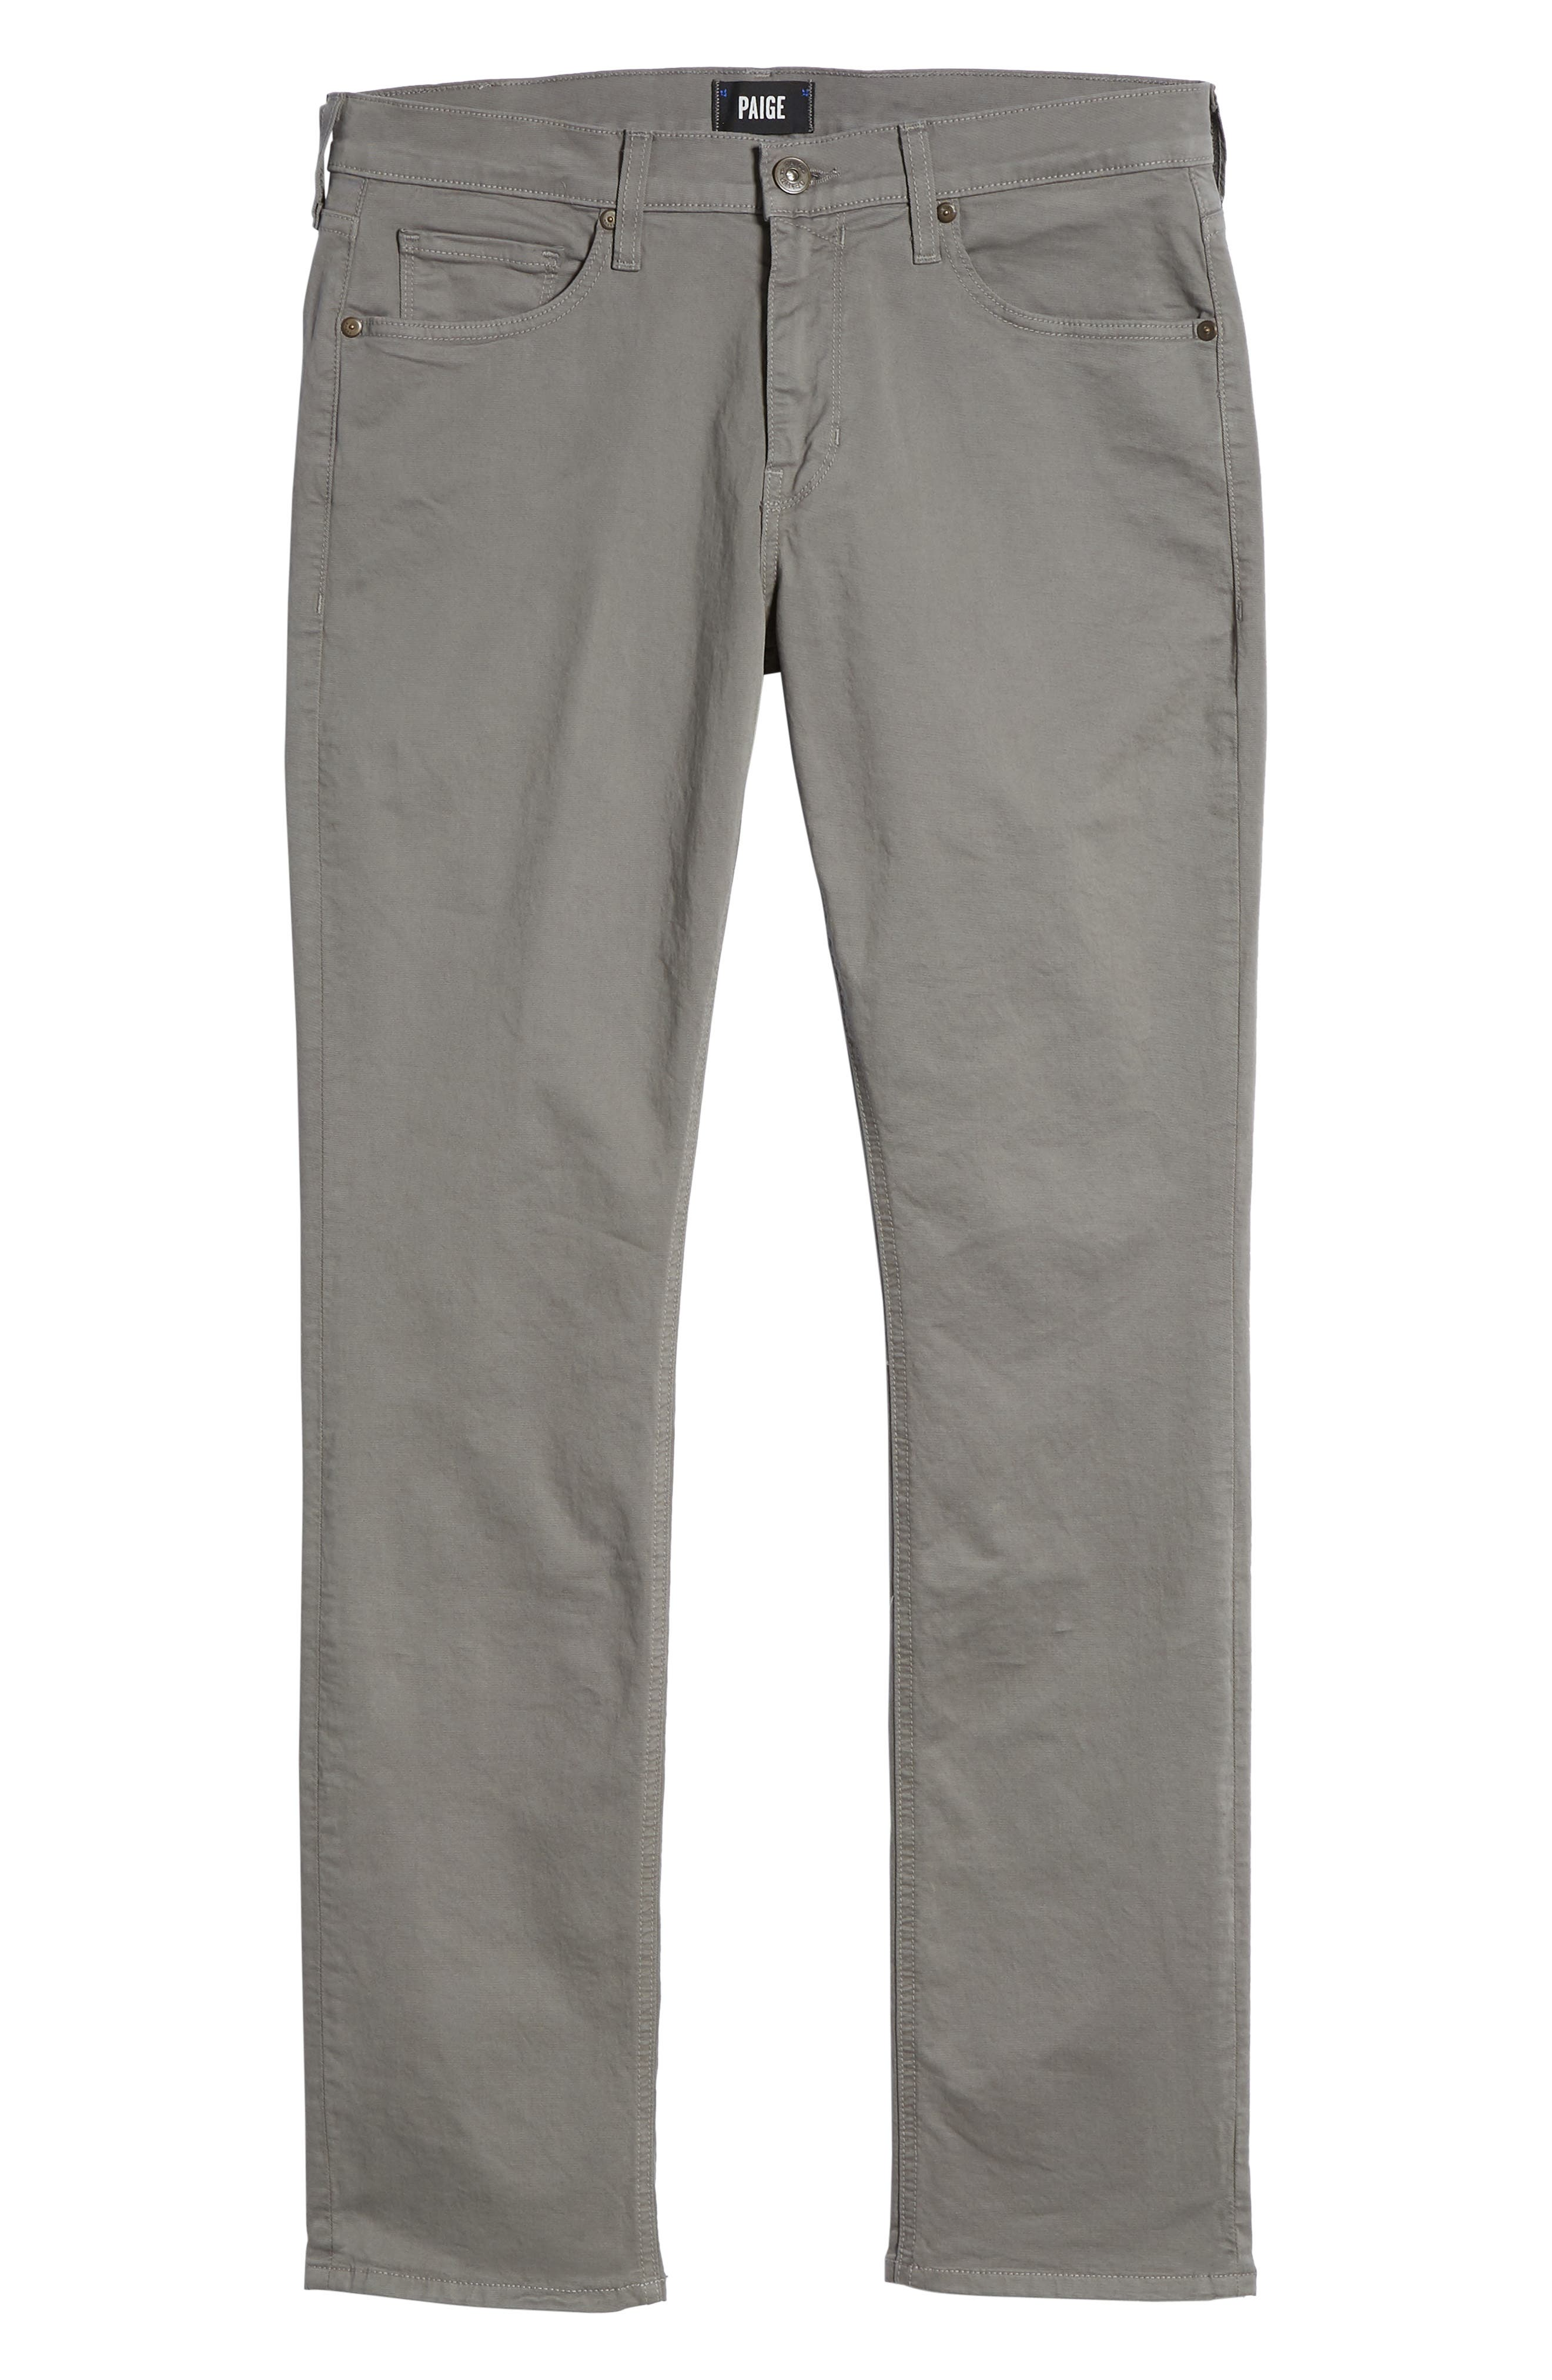 'Federal' Slim Straight Leg Twill Pants,                             Main thumbnail 1, color,                             Granite Stone